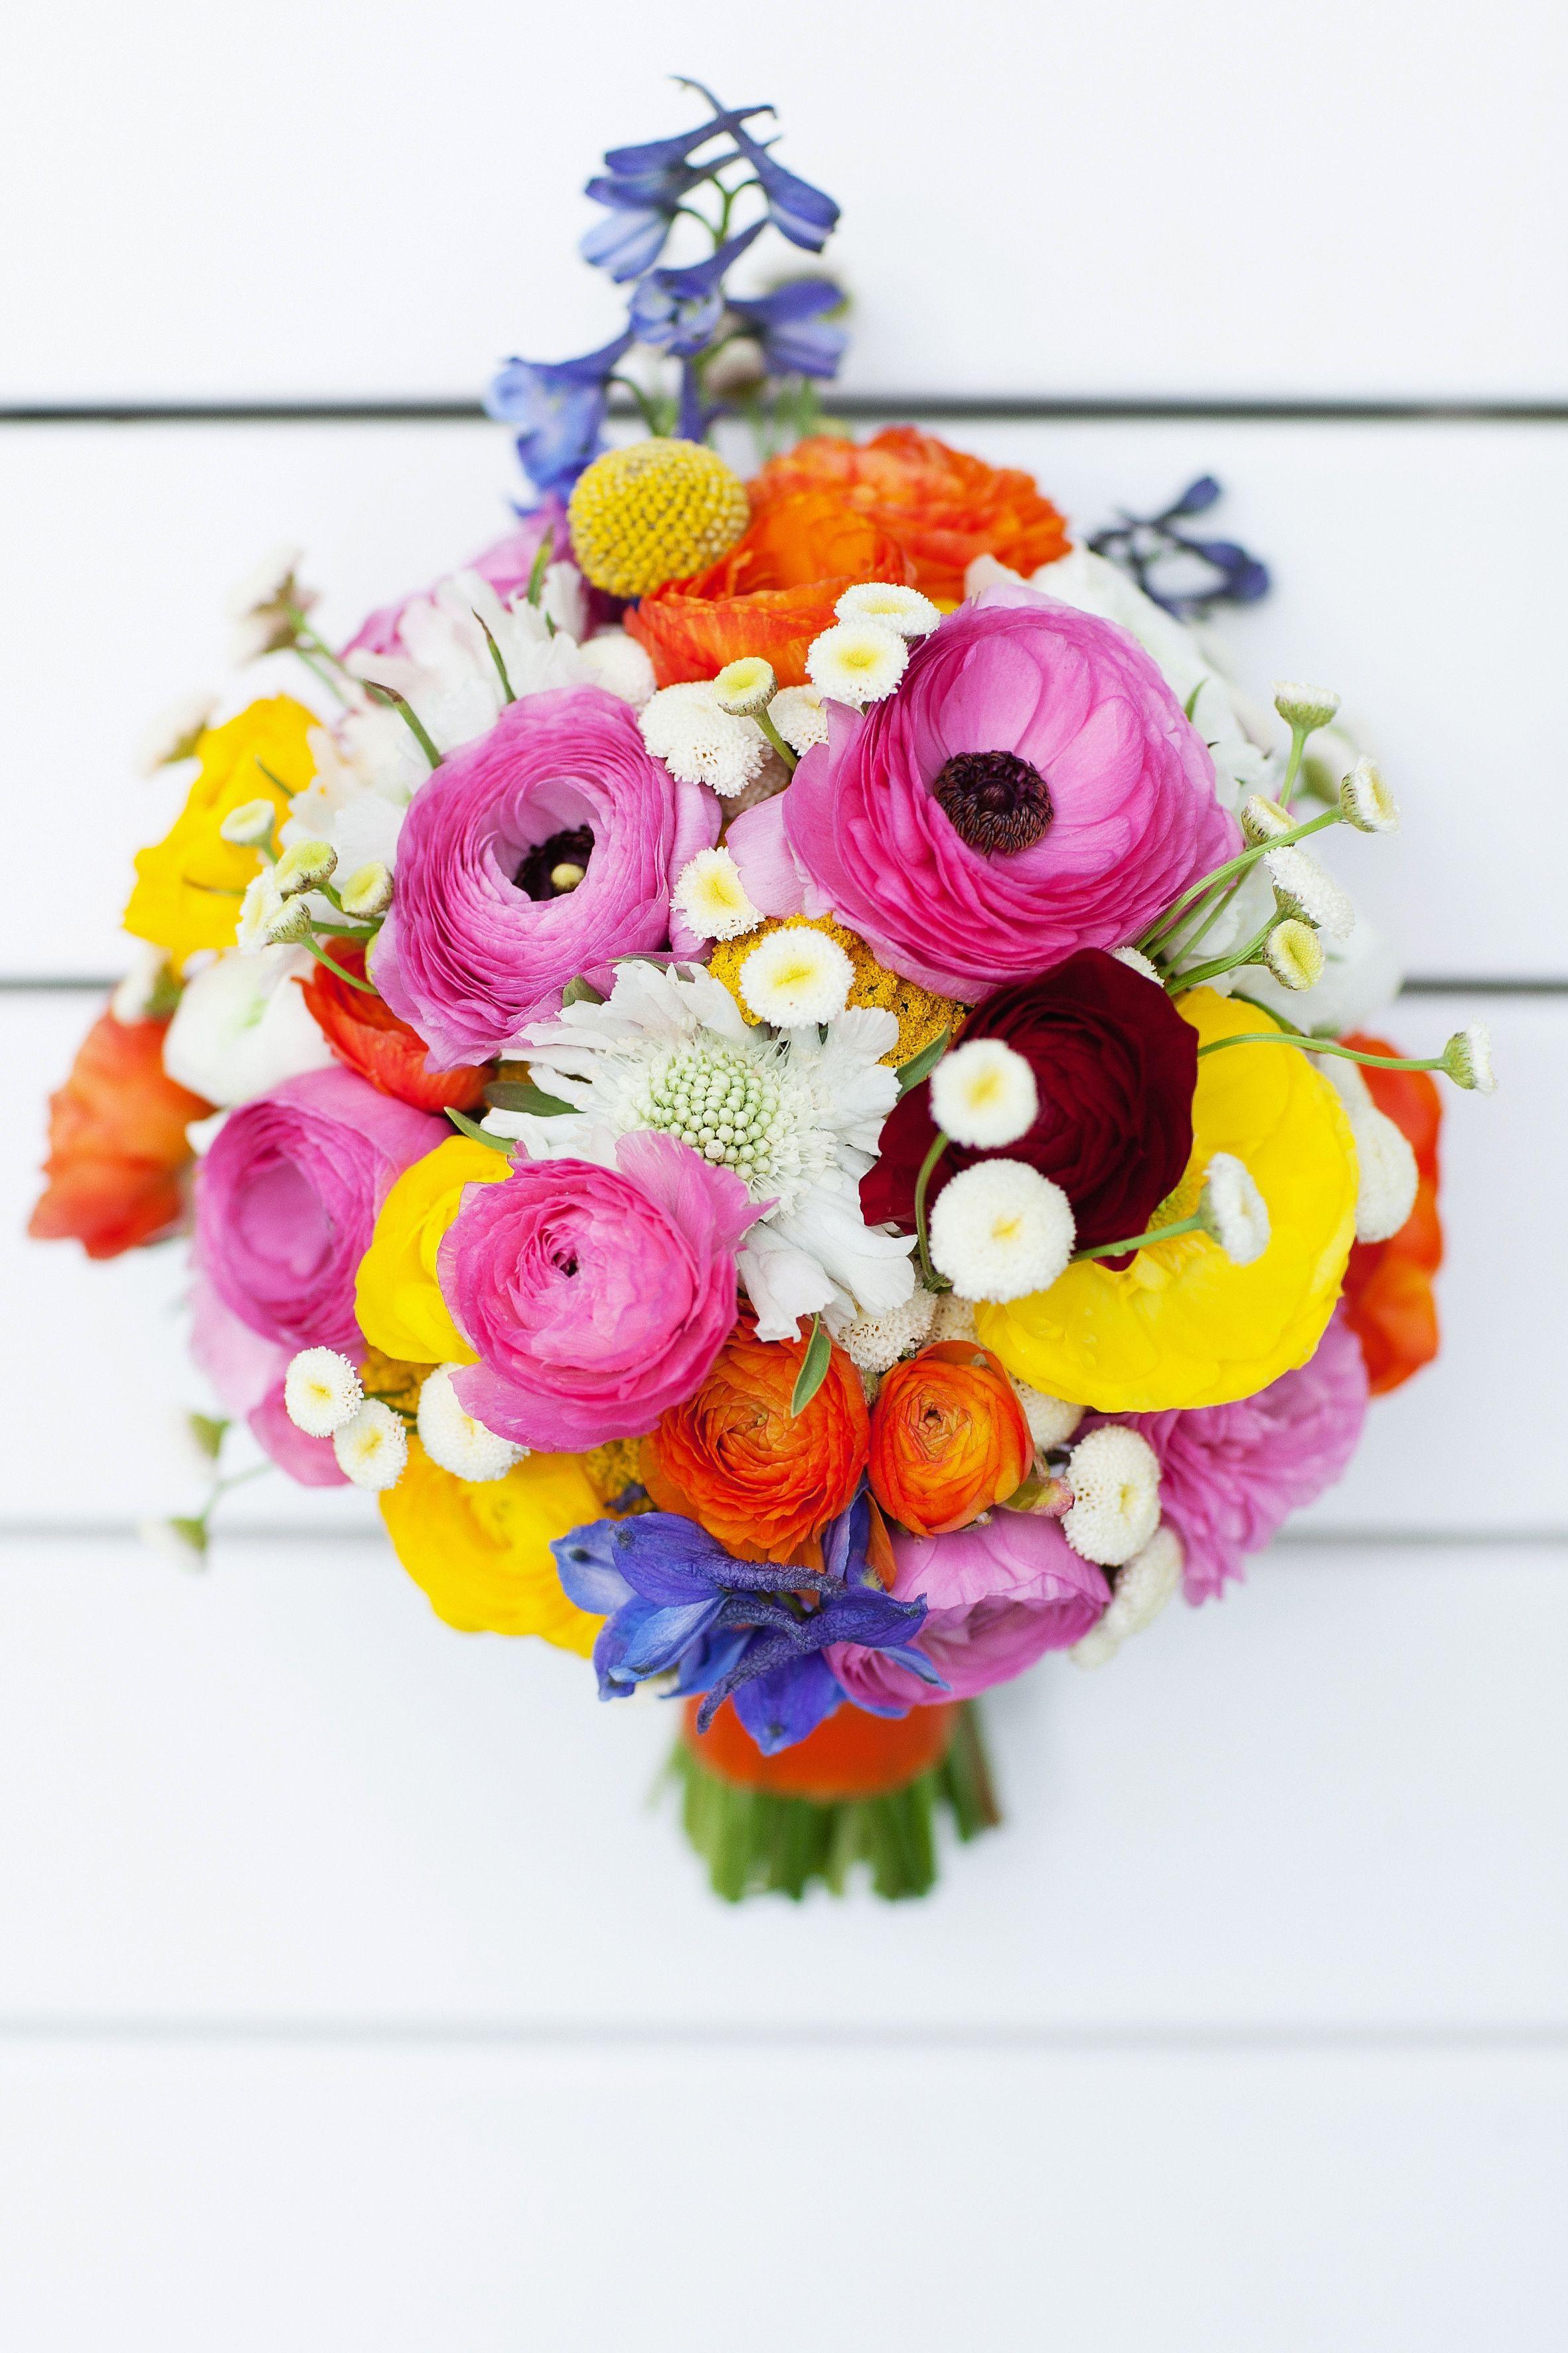 Wedding bouquets not flowers  Pin by Julia Engel on Flowers  Pinterest  Flowers Centerpieces